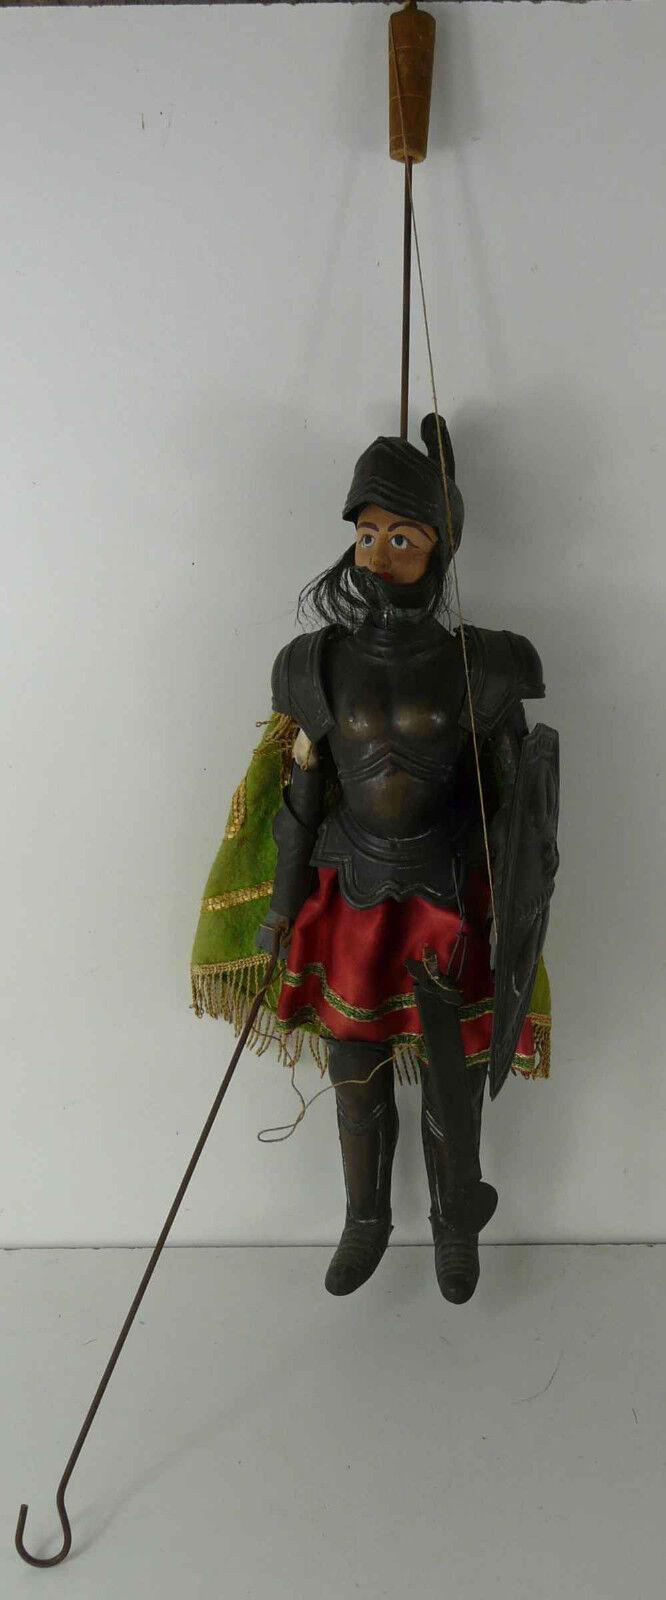 Marionette sizilianische gegen 1960 1960 1960 marionette italienische n°2 384448